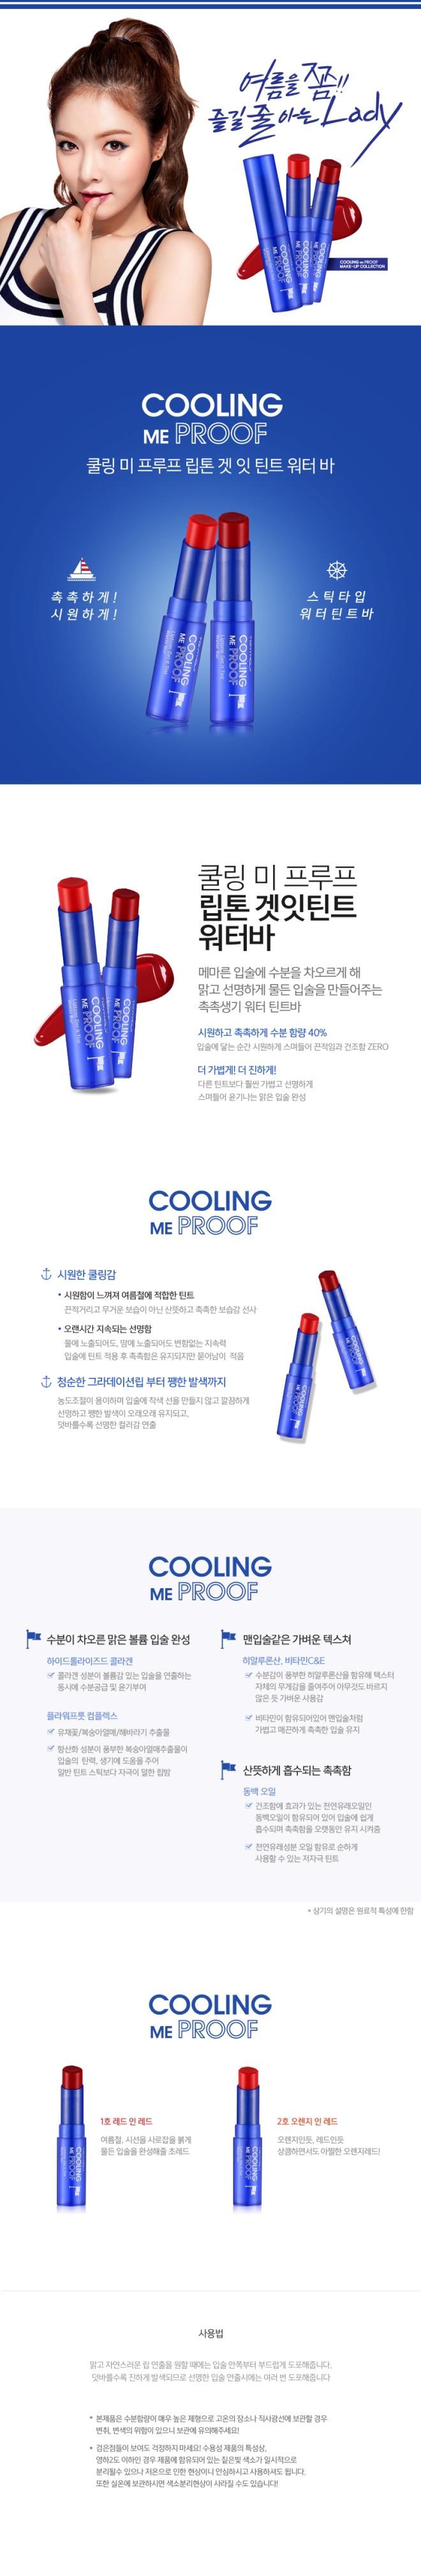 Credit: Tonymoly Korea website